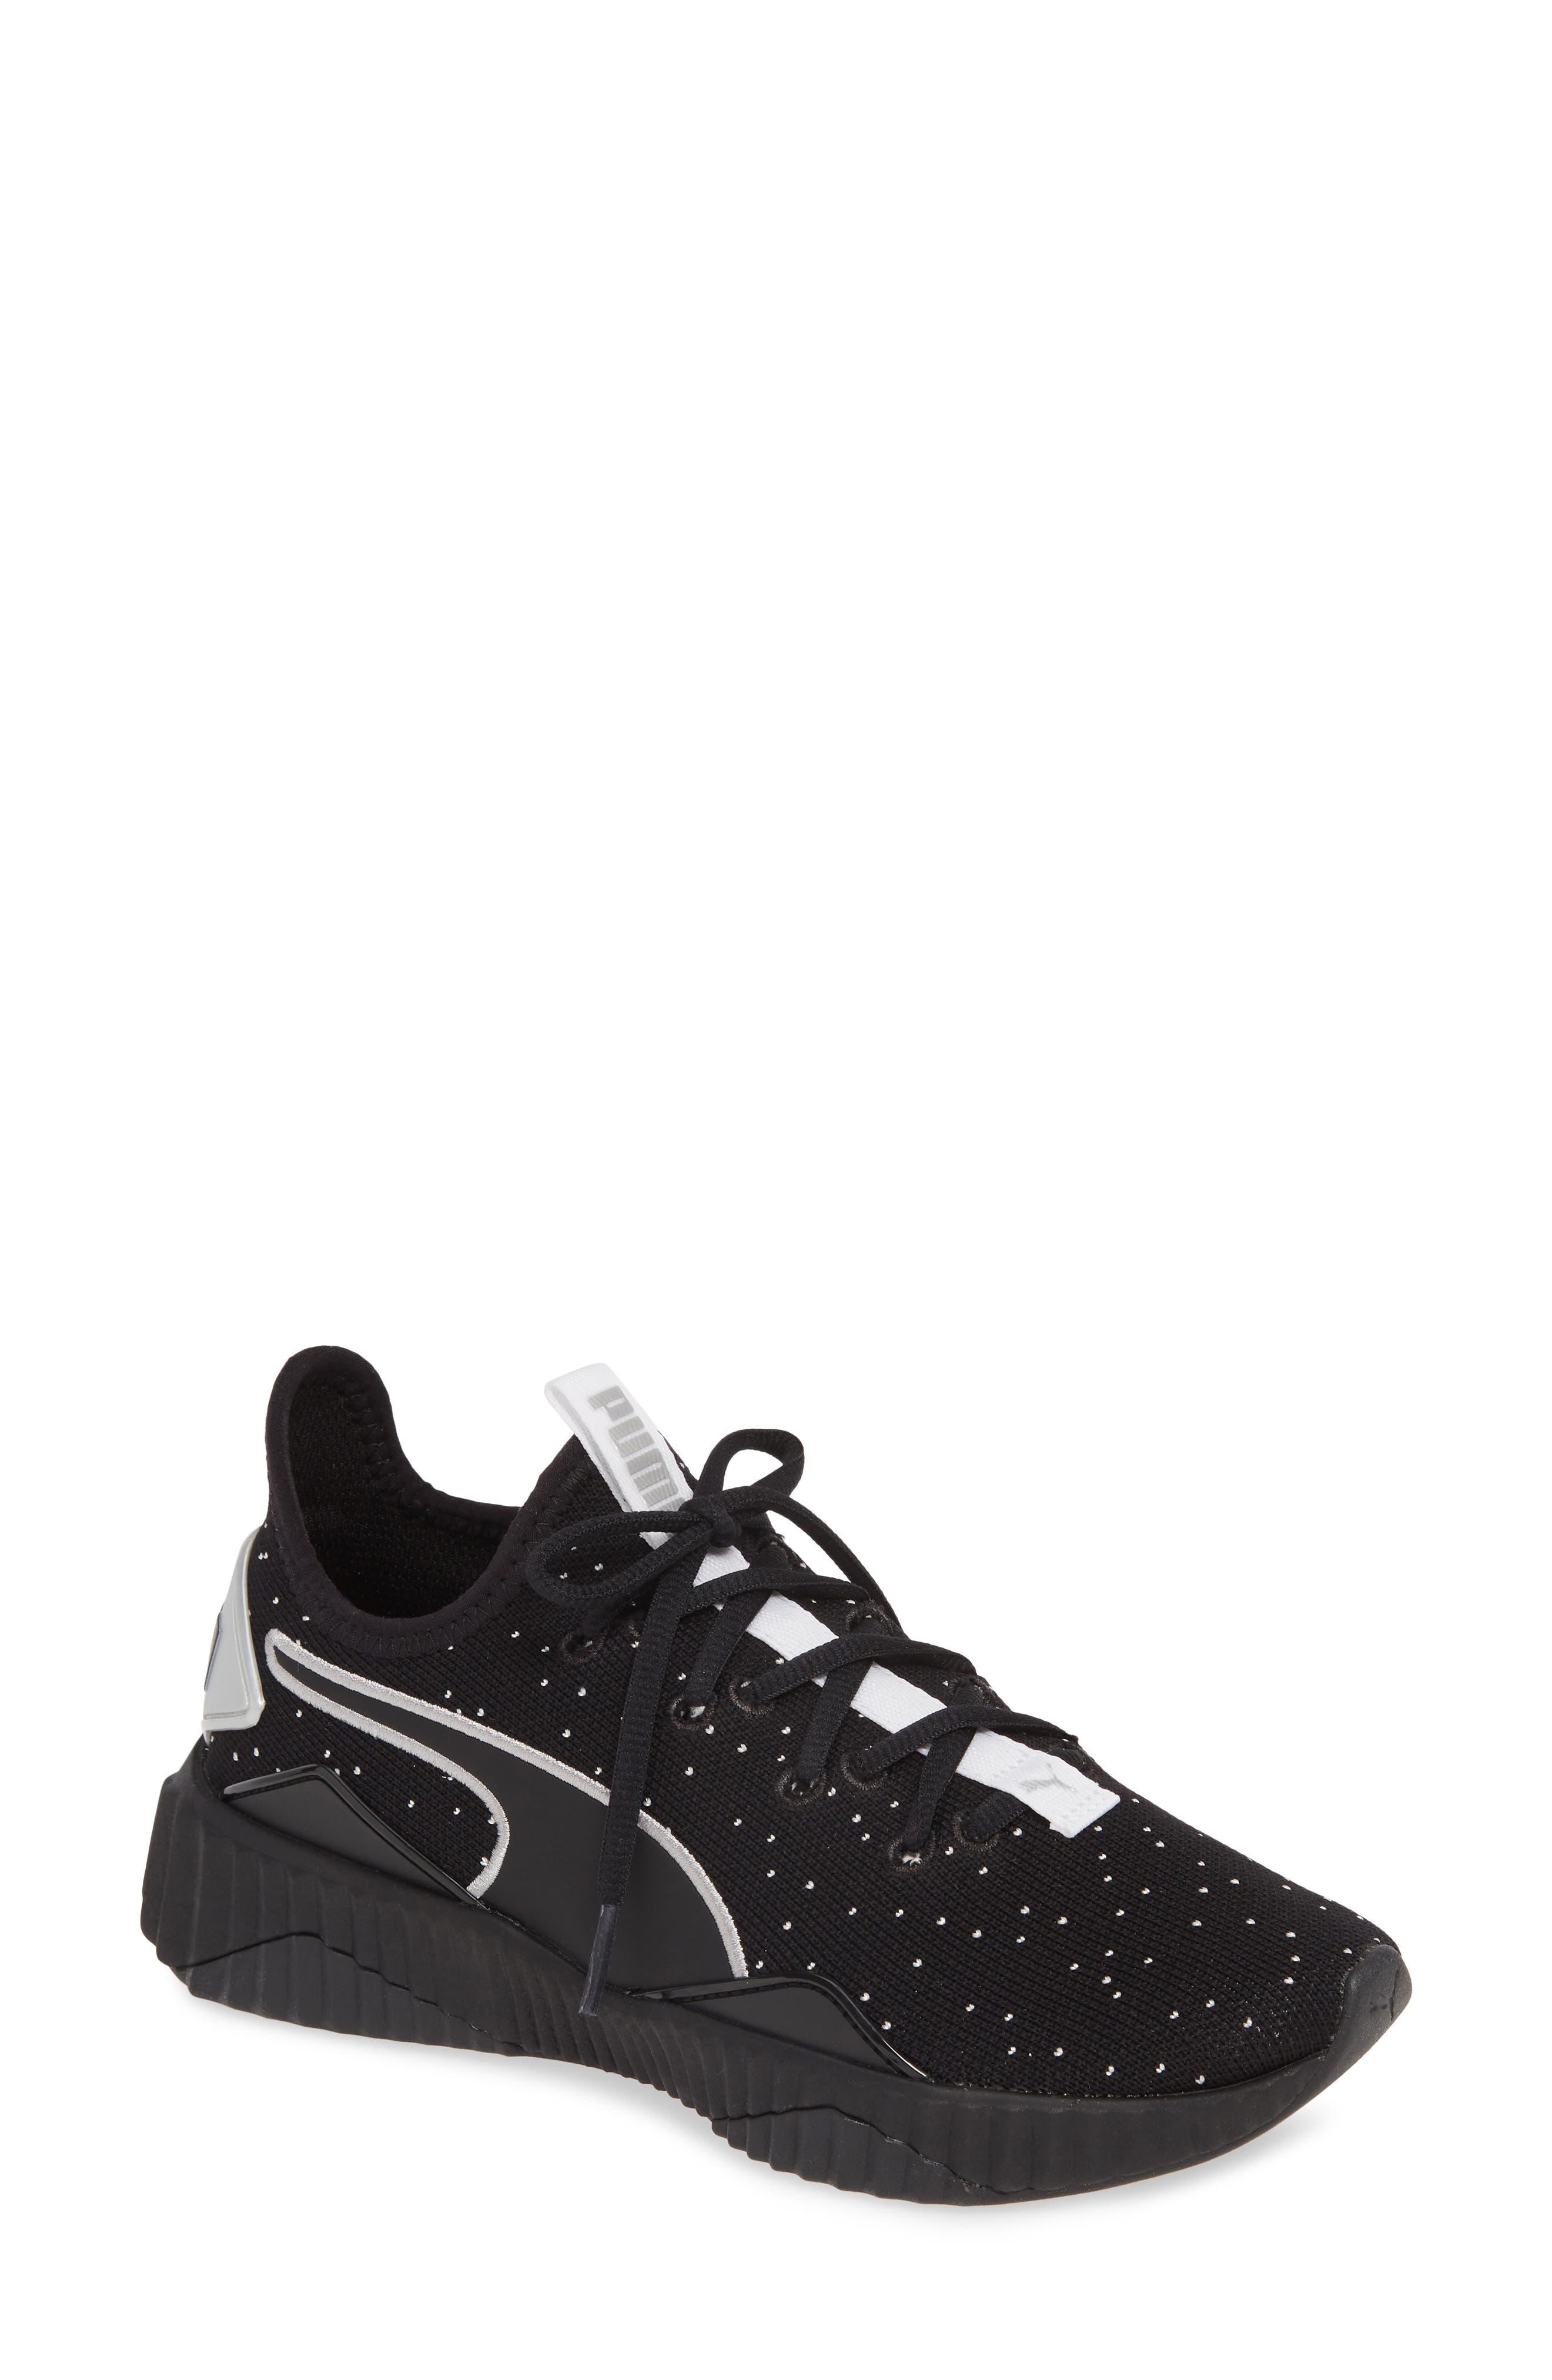 Puma Defy Speckle Training Shoe, Black